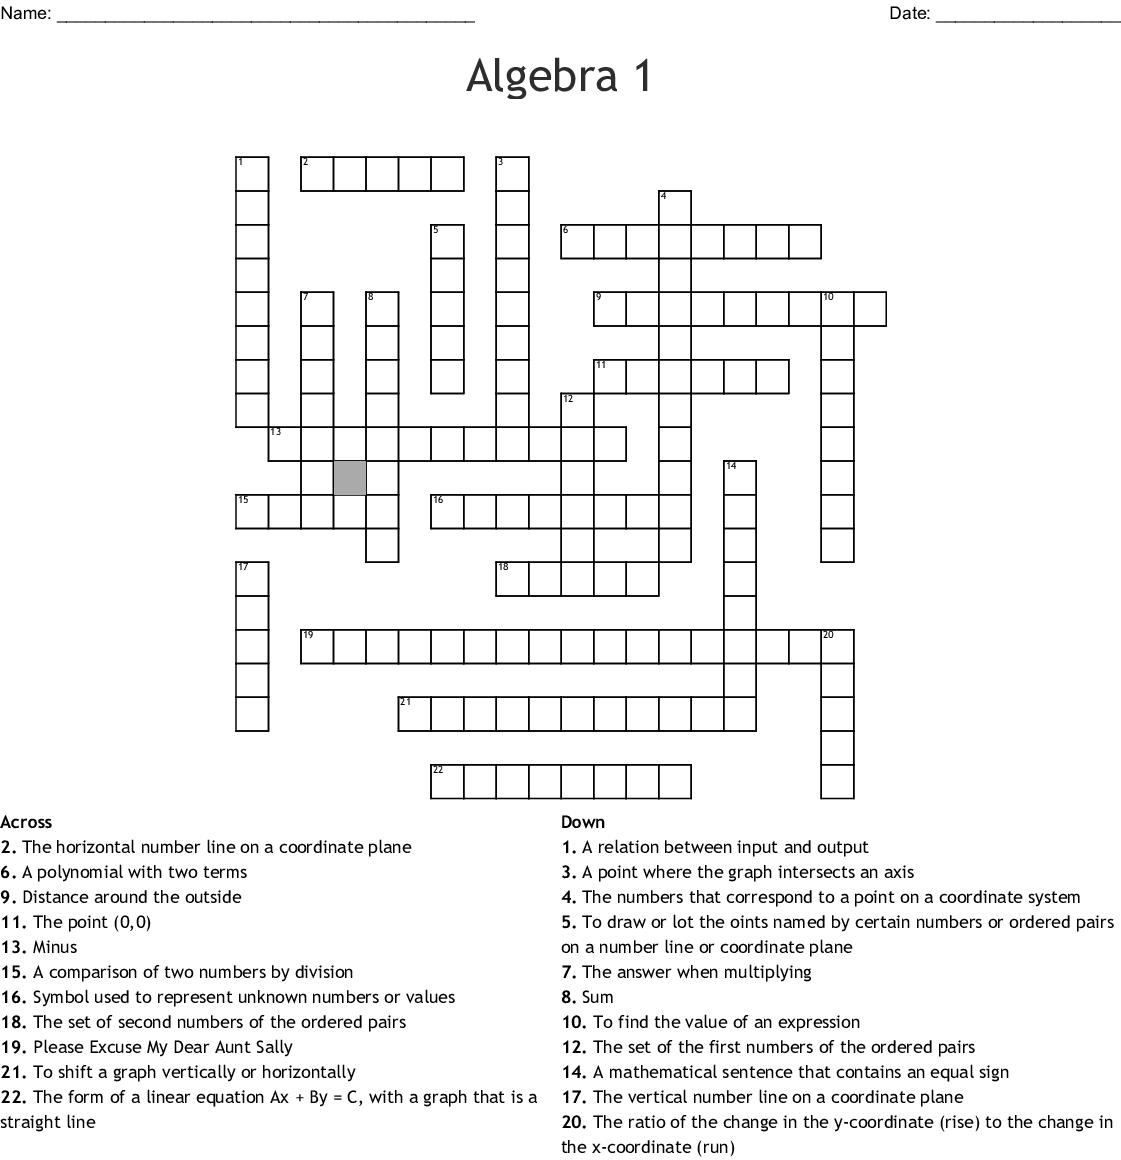 Algebra 1 Crossword - Wordmint - Algebra Crossword Puzzle Printable